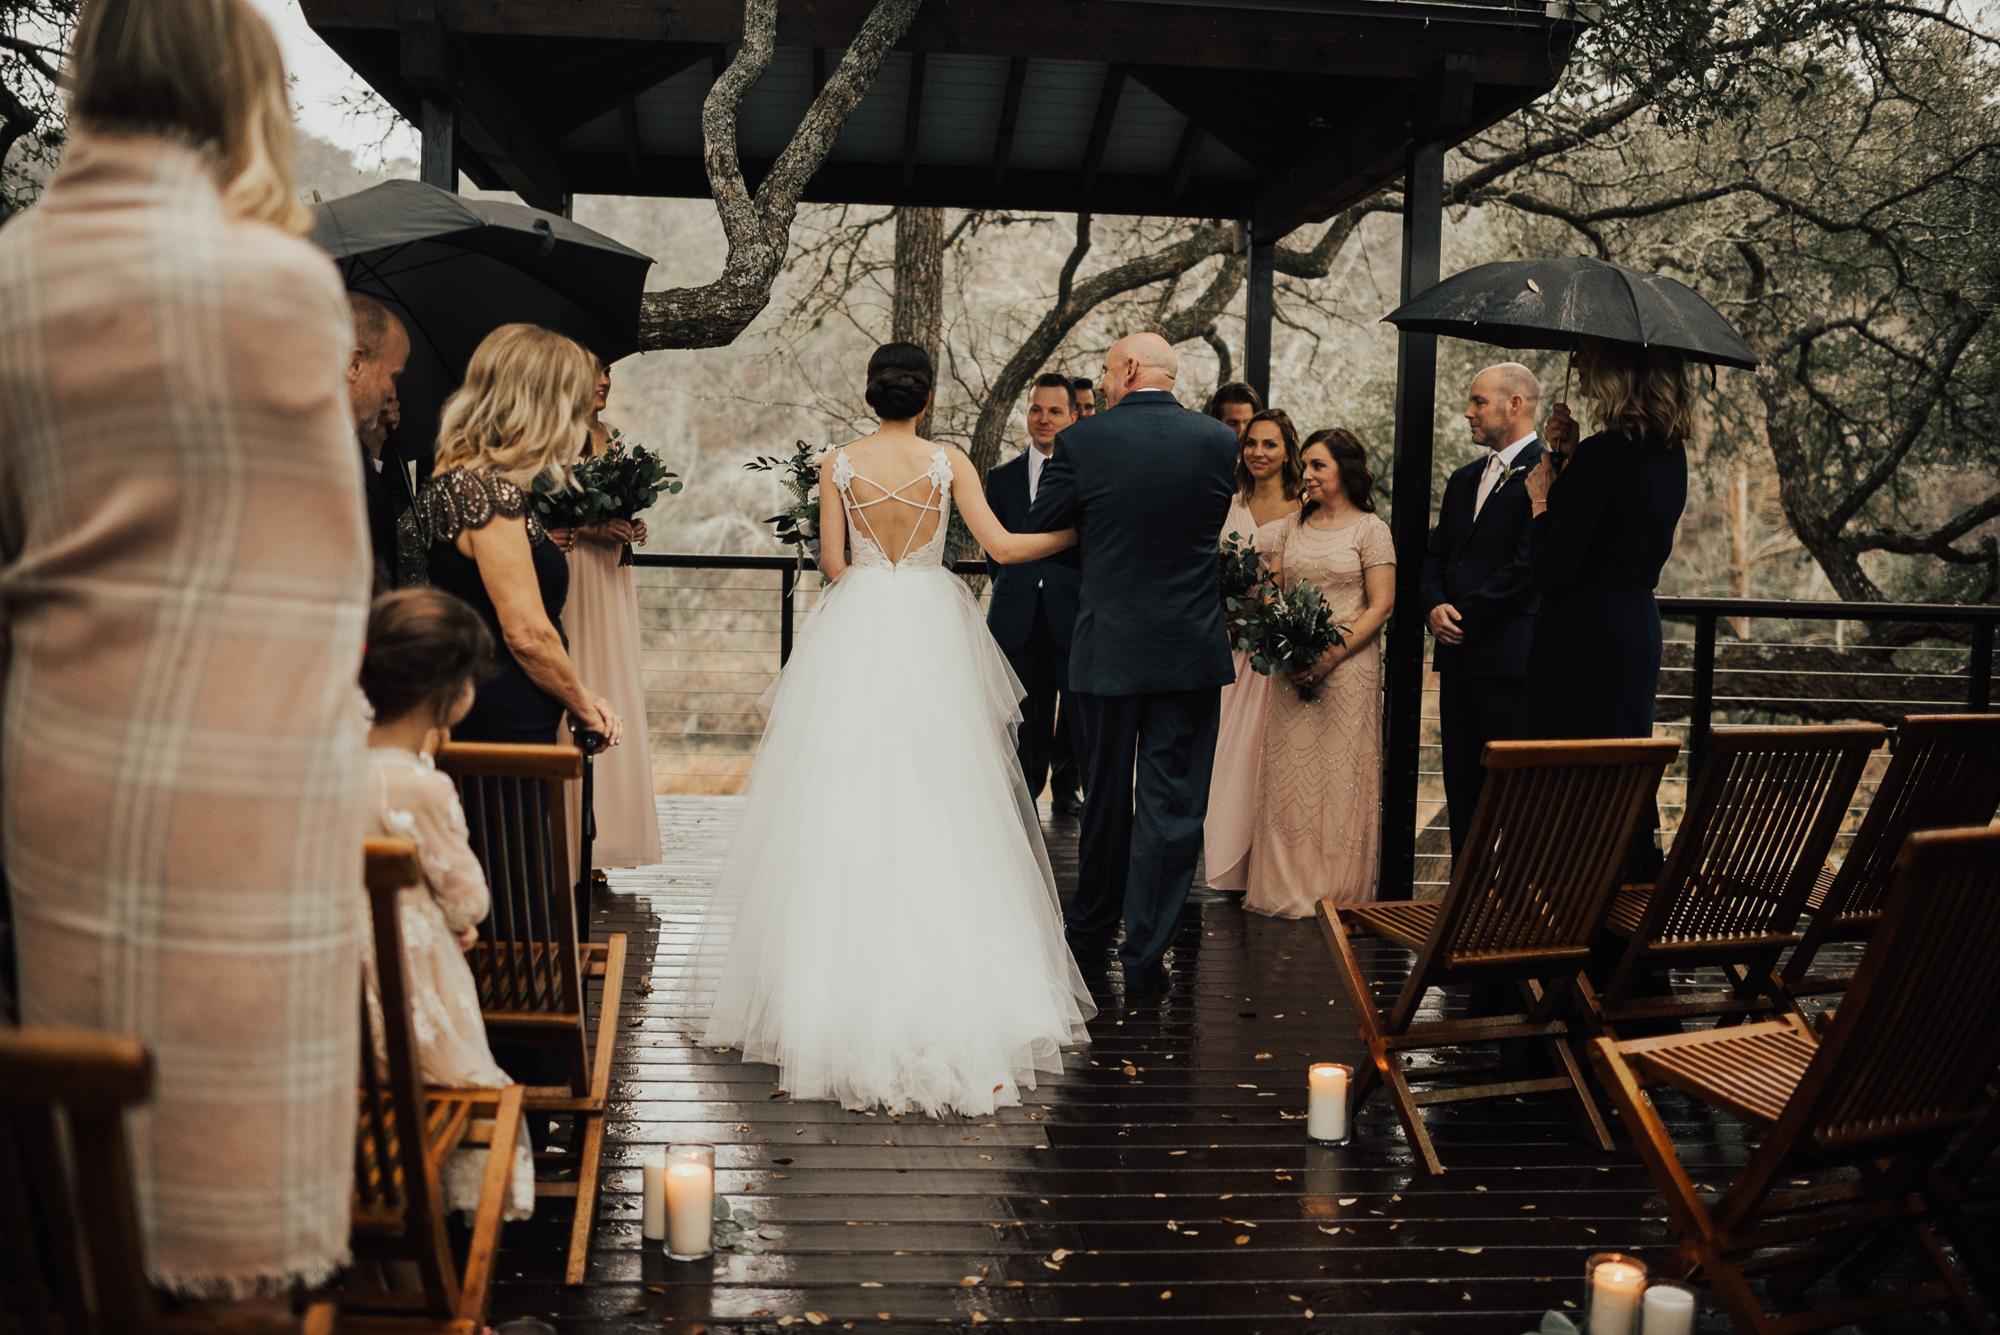 camp-lucy-wedding-206.jpg